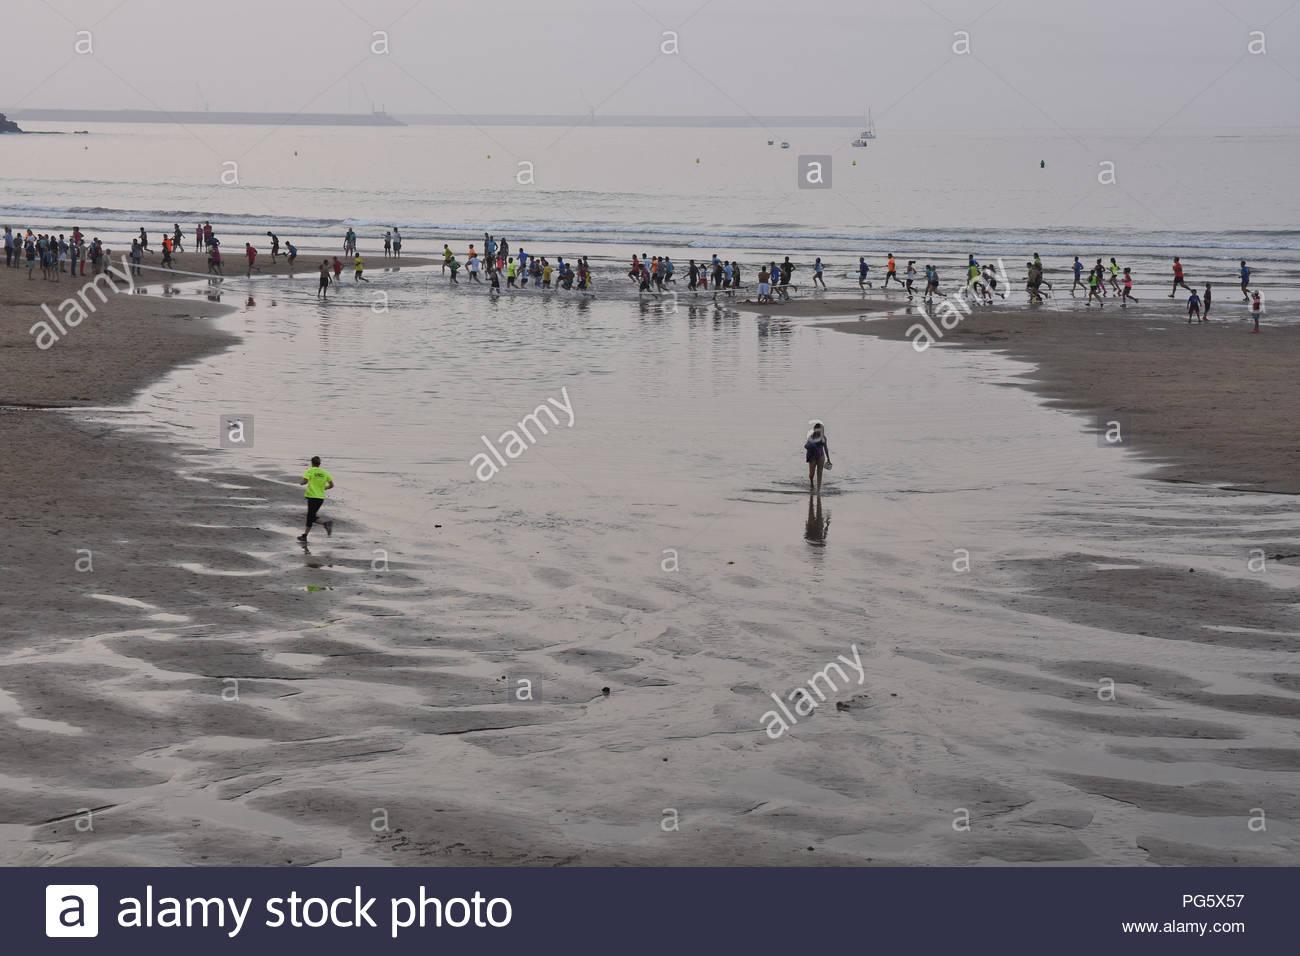 People leisure activities misty Atlantic coast. Gijon Asturias Northern Spain Europe. - Stock Image